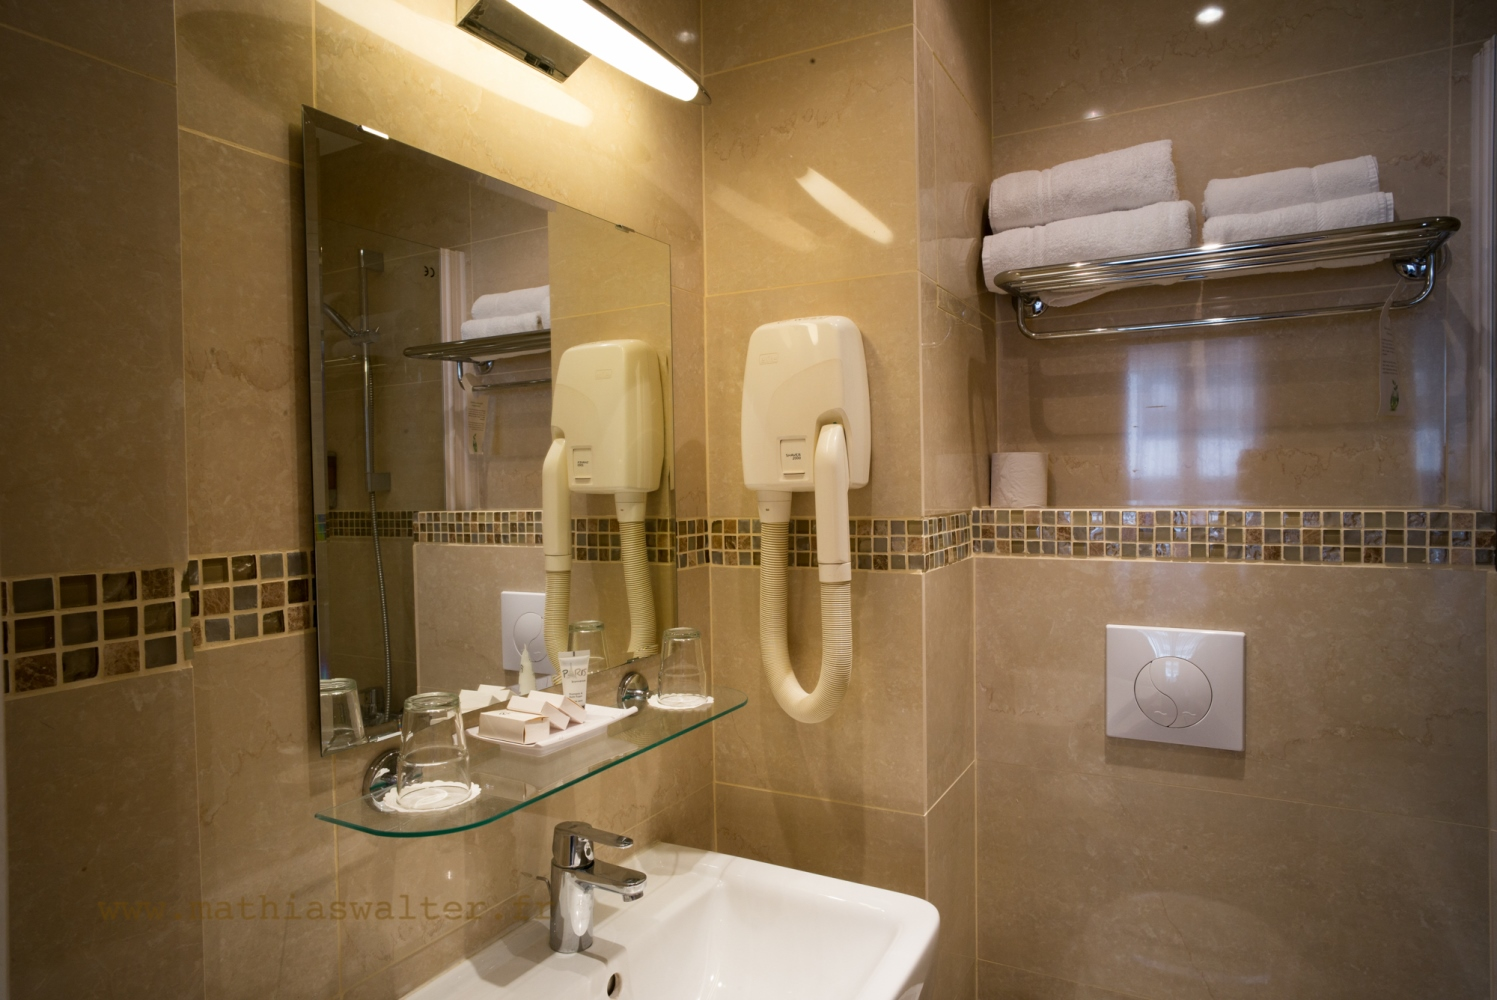 Baignoire dans chambre chambre hotel jacuzzi alsace - Hotel avec baignoire balneo dans la chambre ...